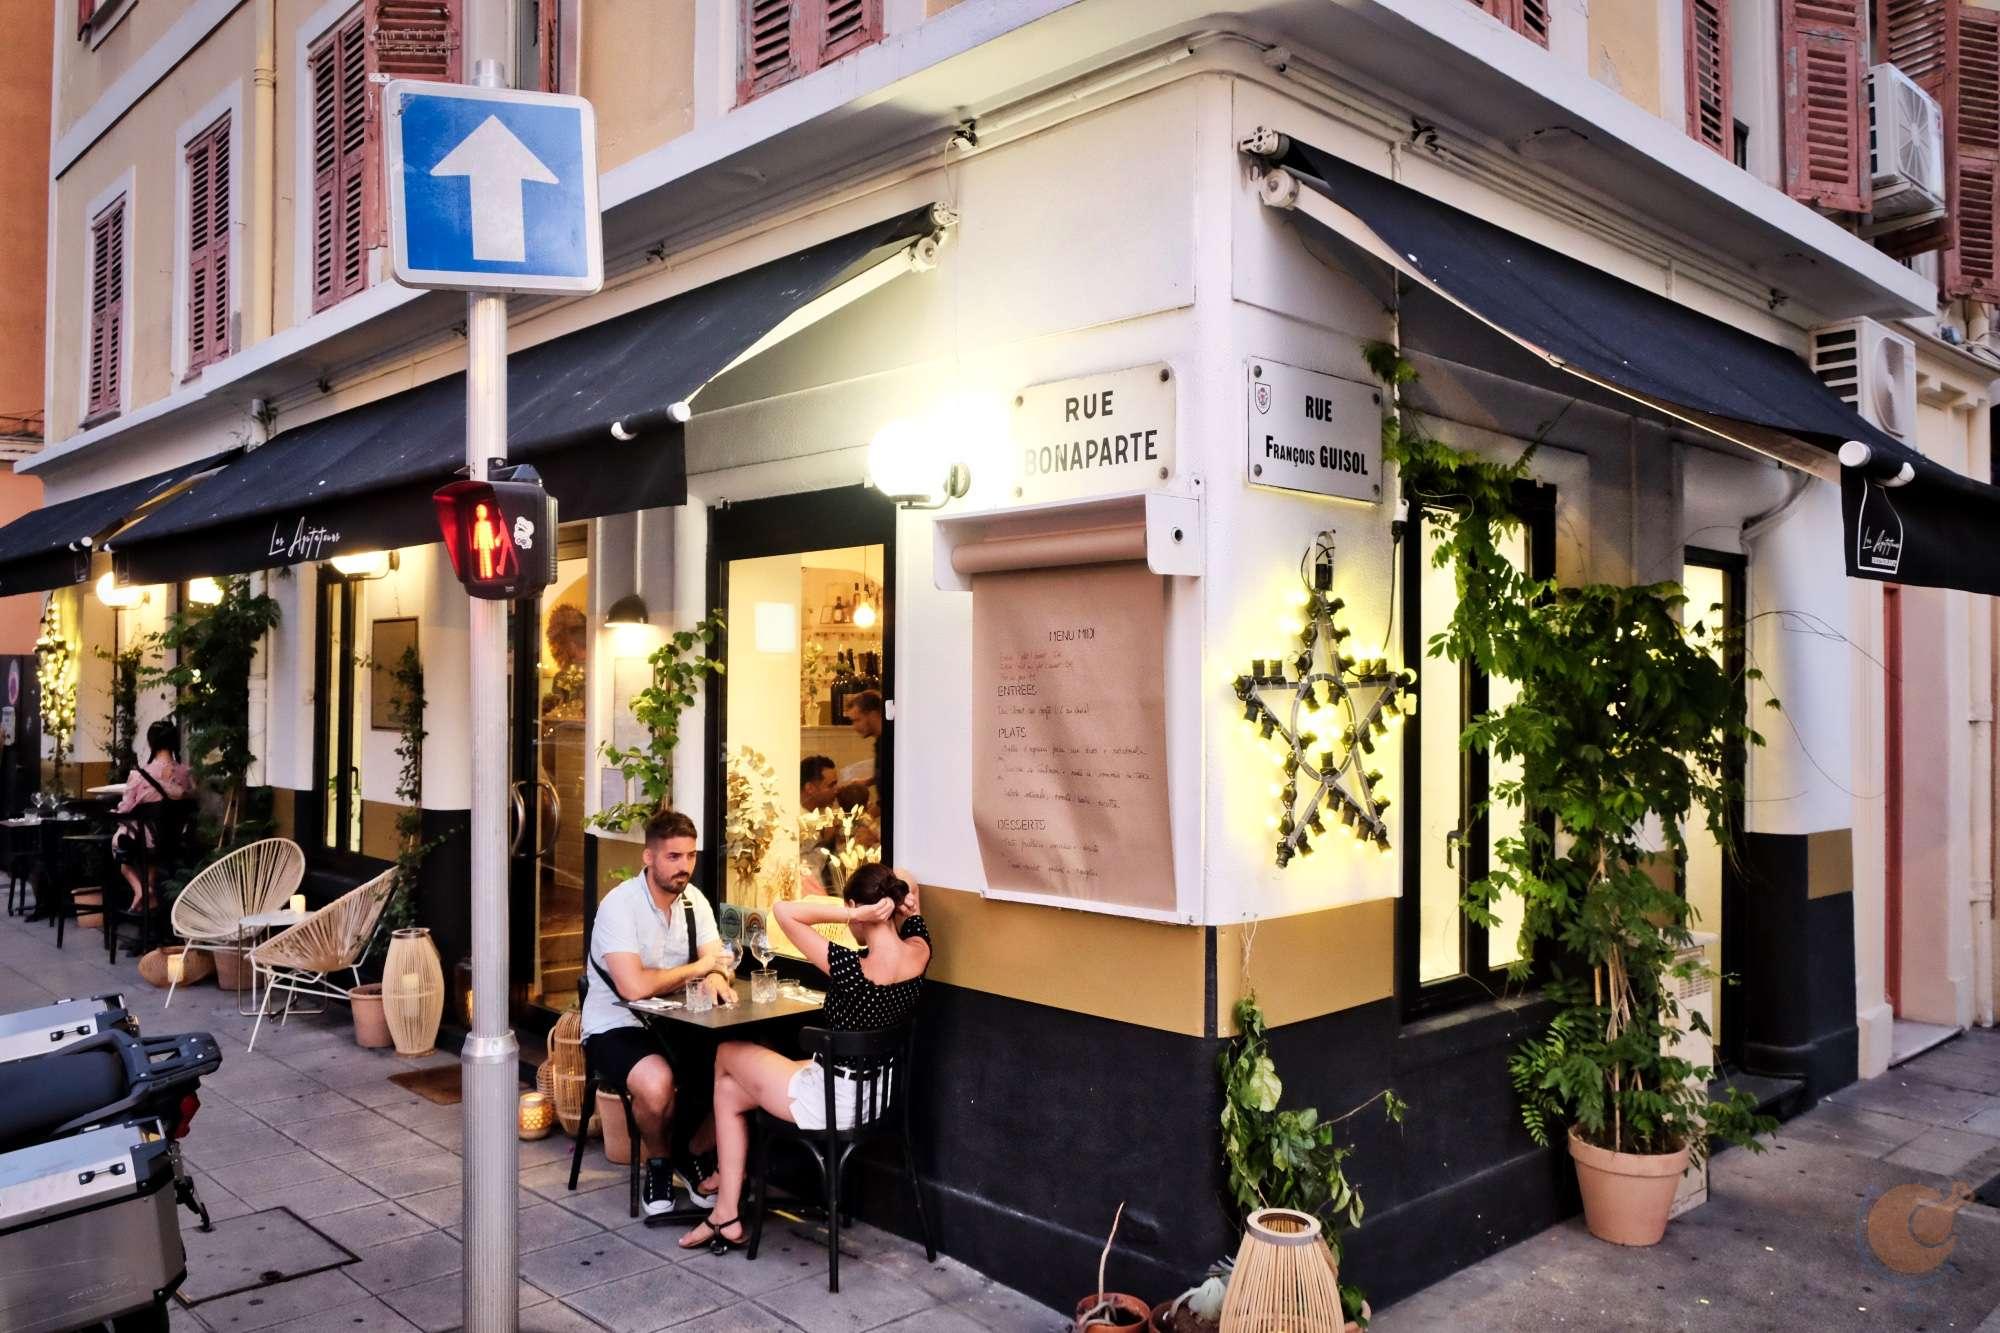 dscf1397_les_agitateurs_restaurant_france_nice_nizza_vilagevo_jokuti_andras_l_w.jpg